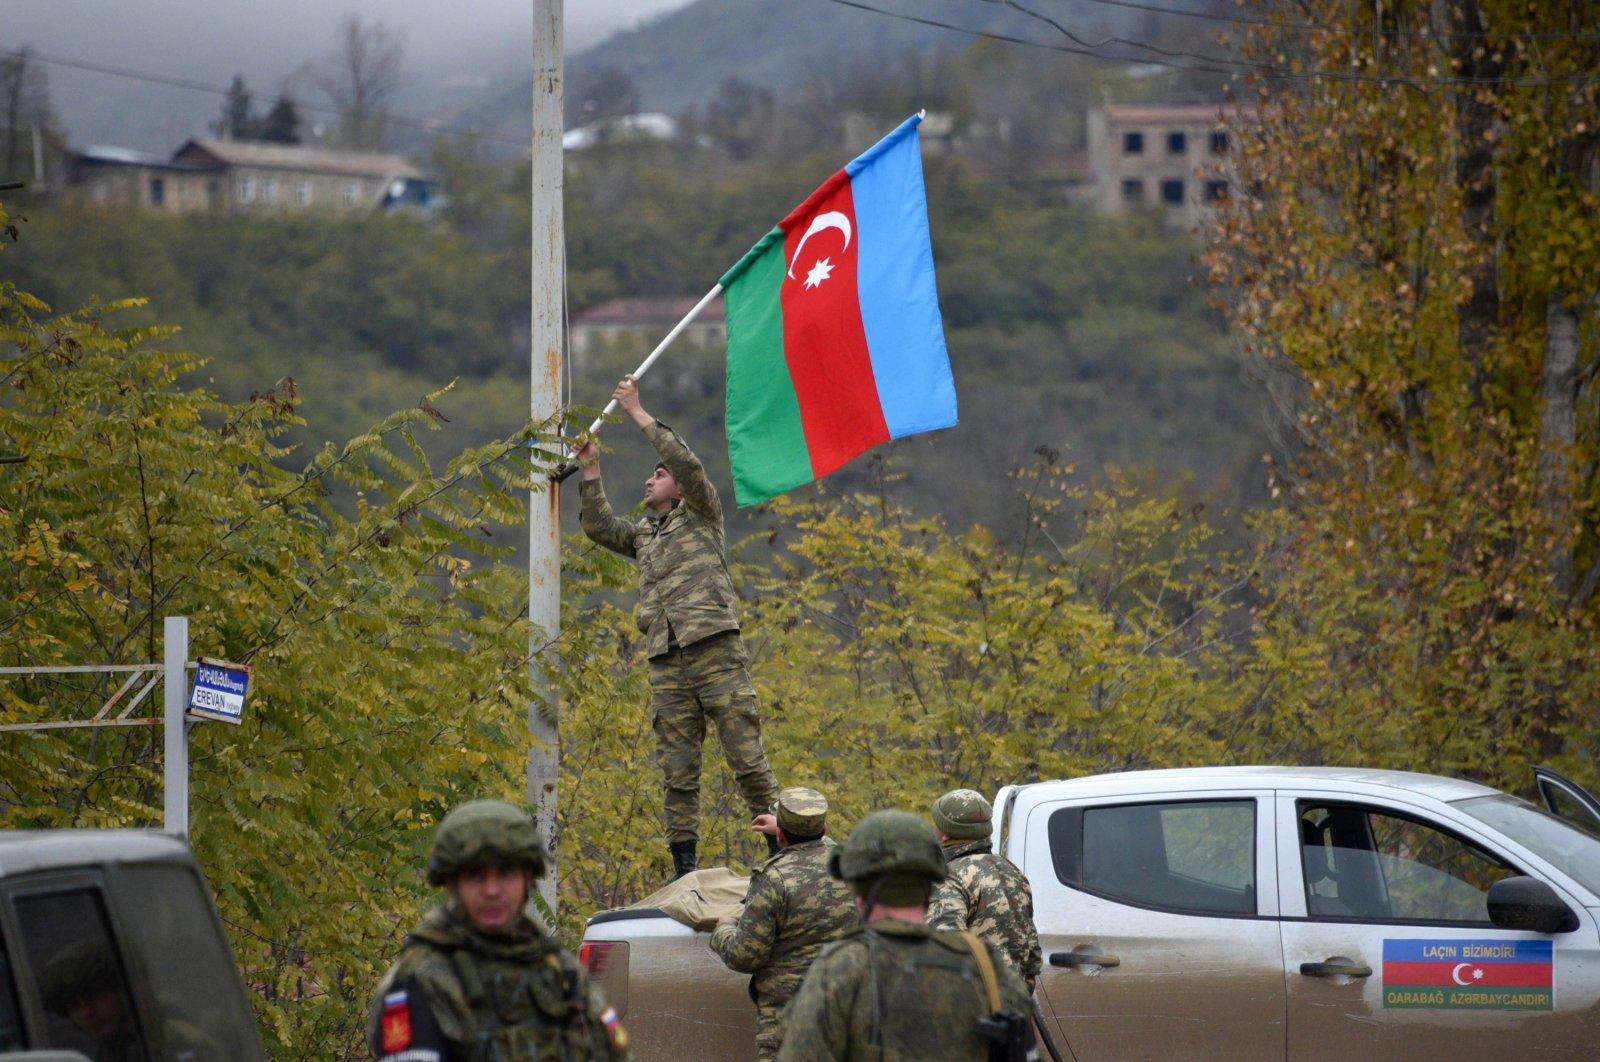 An Azerbaijani soldier fixes a national flag on a lamppost in the town of Lachin, the Nagorno-Karabakh region, Azerbaijan, Dec. 1, 2020. (AFP Photo)